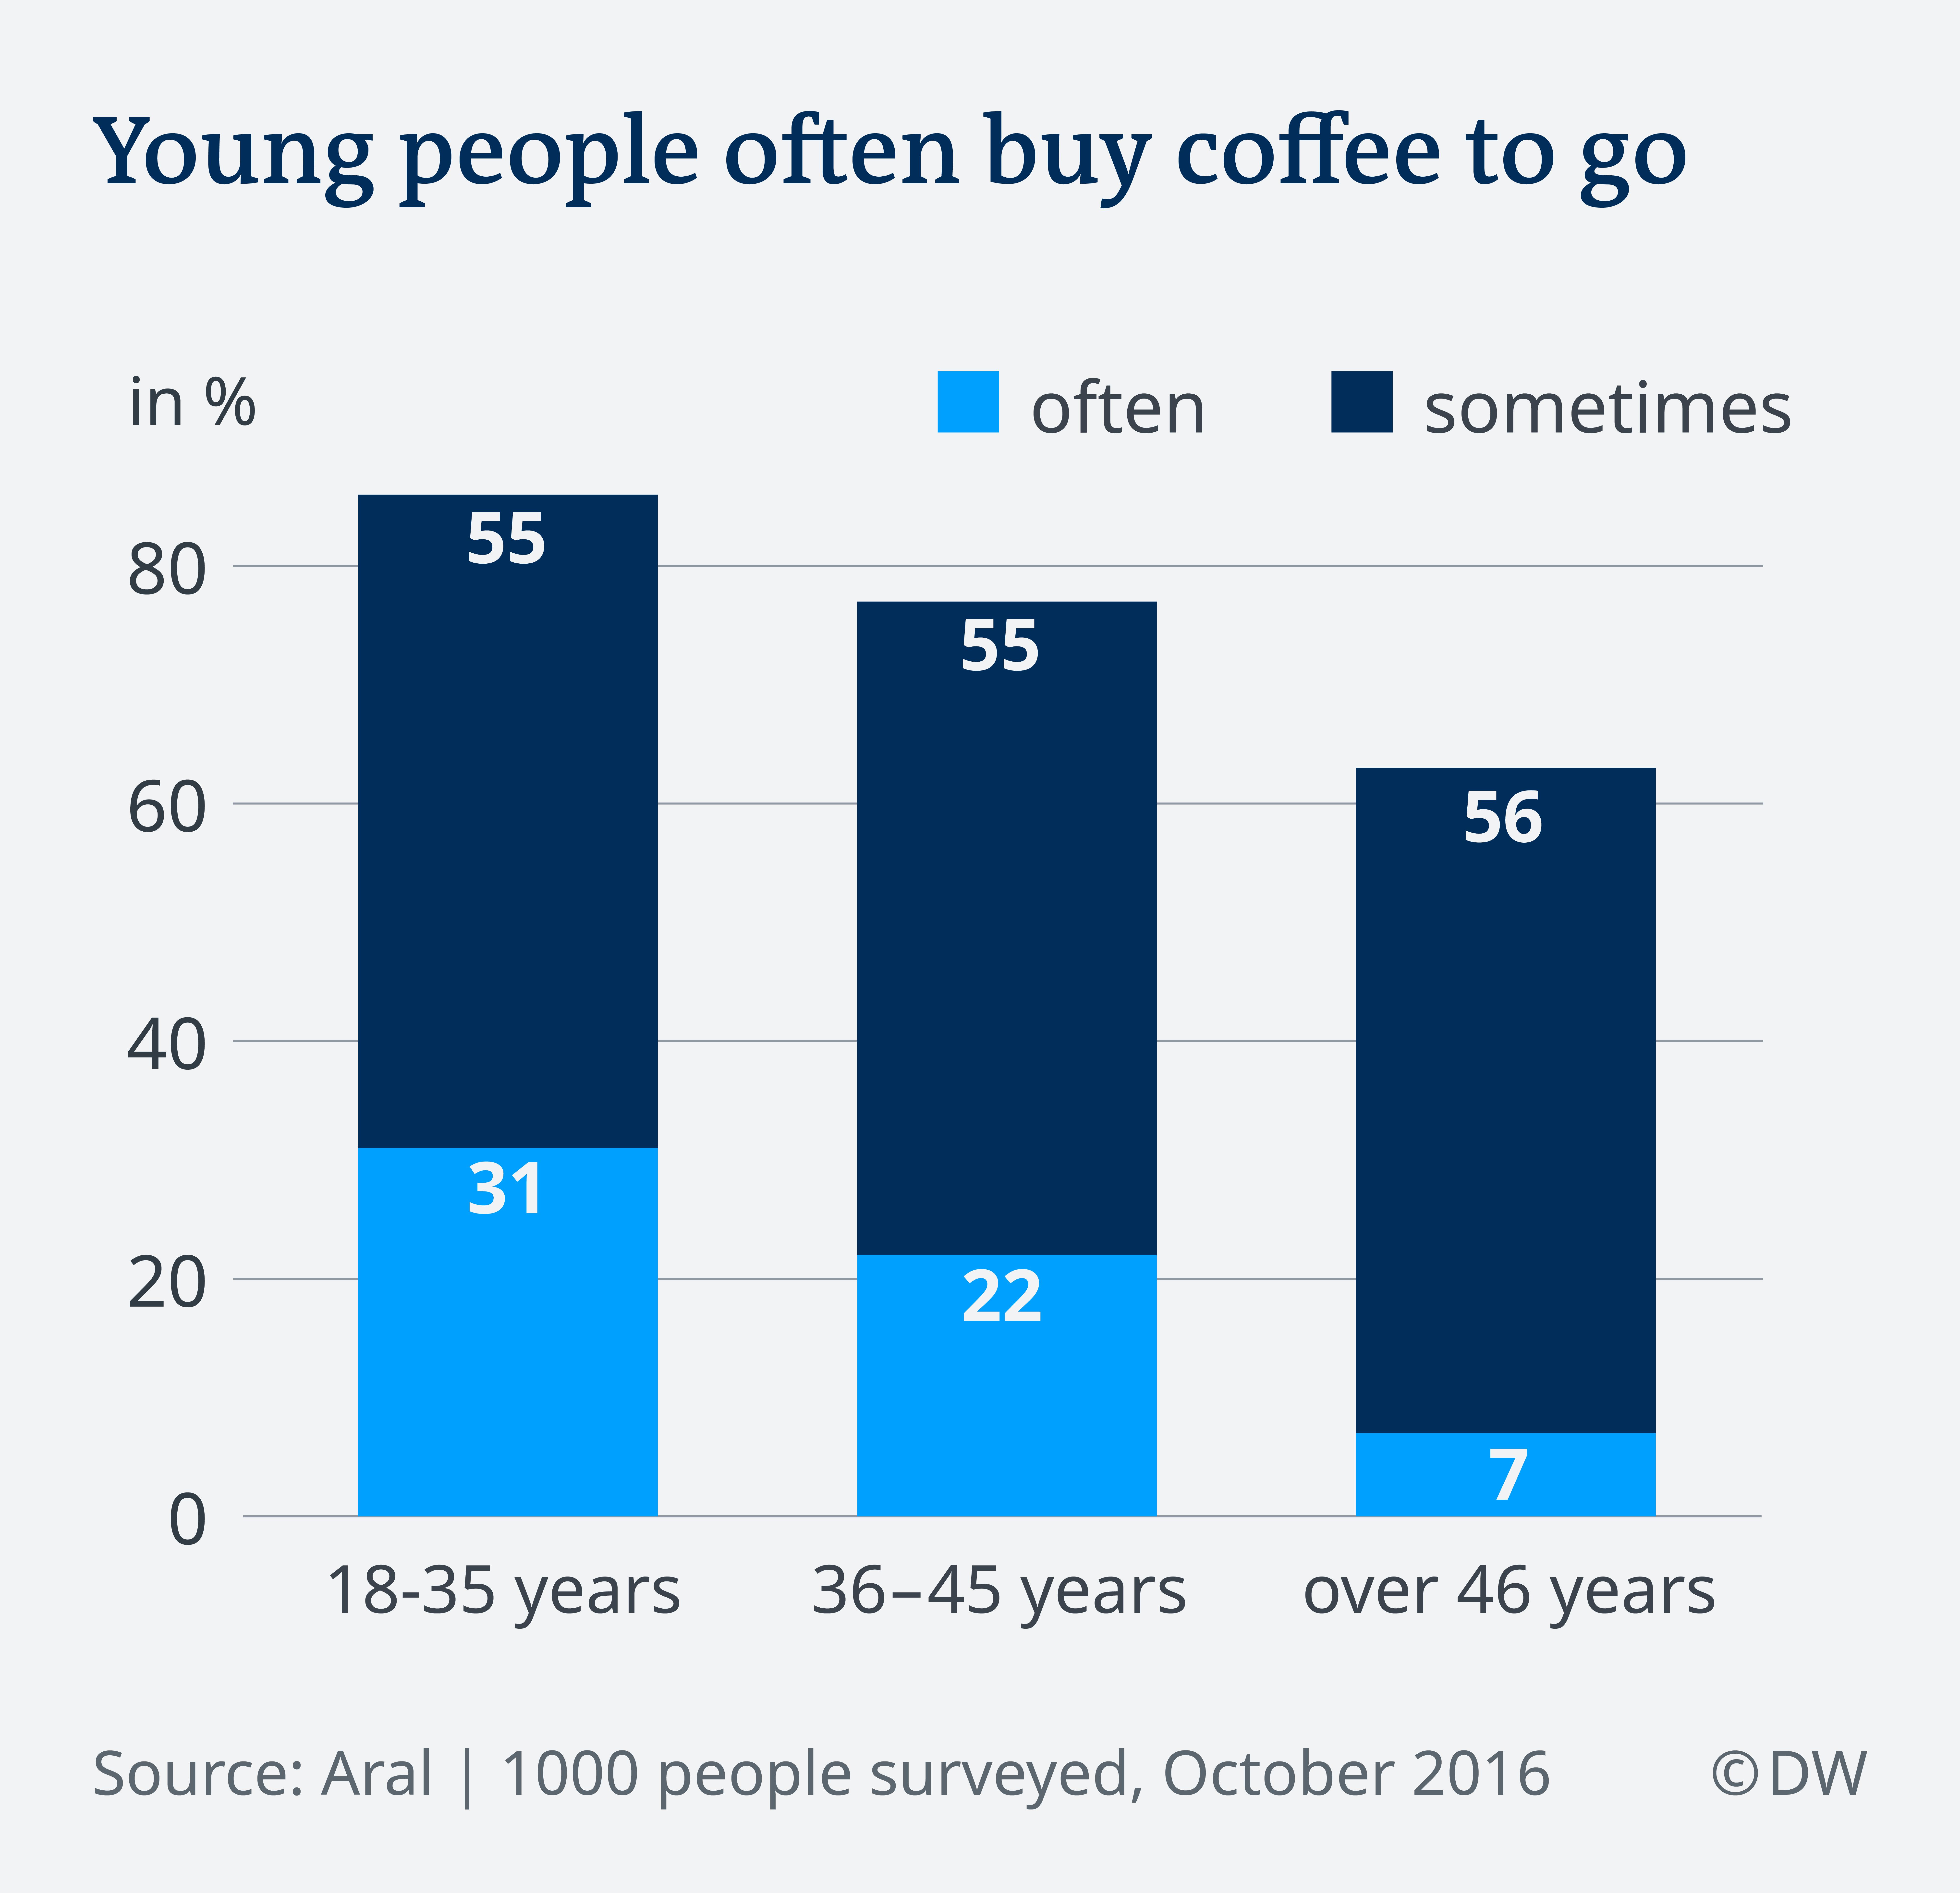 Dobna skupina korisnika Coffee to go